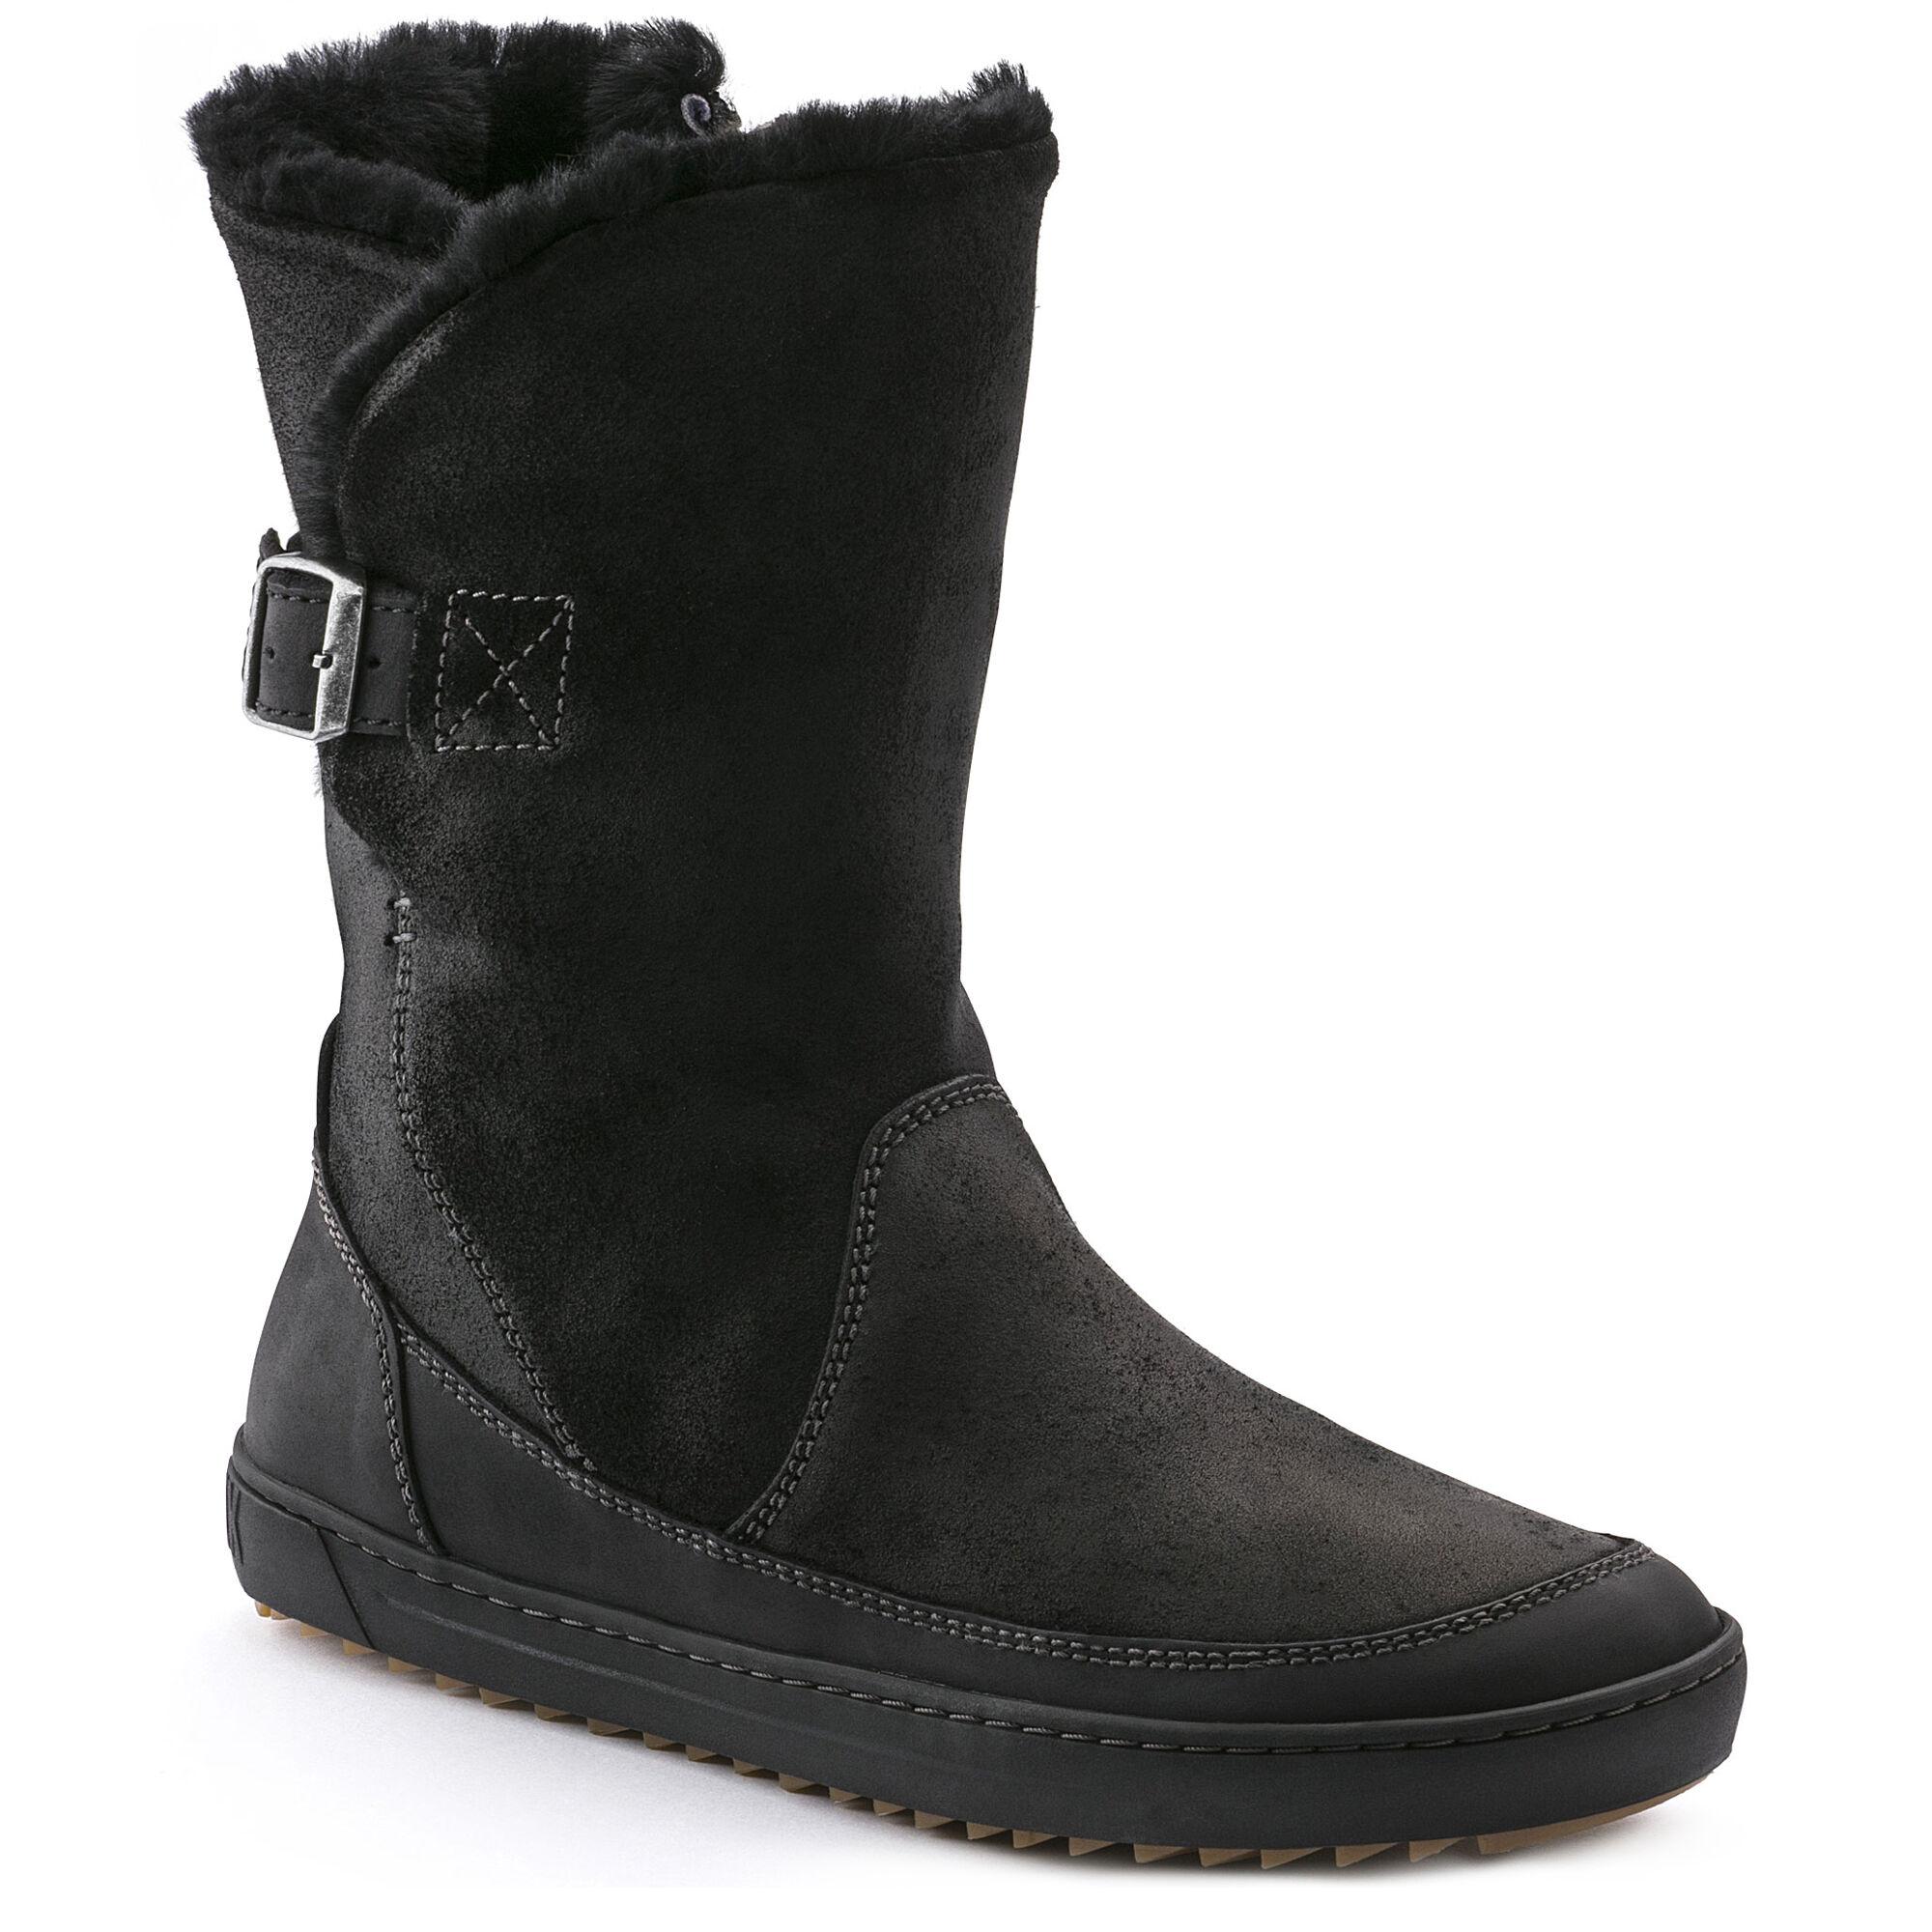 Woodbury Suede Leather | shop online at BIRKENSTOCK